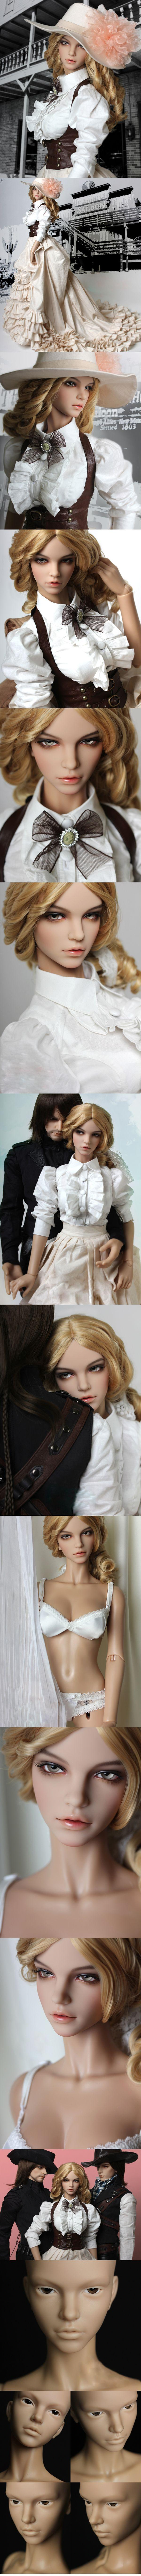 iplehouse Bibiane [Bibiane_Special Edition] - $199.00 : BJD baby,bjd dolls,bjd doll shop,bjd bragan?a,fairyland,volks bjd,soom,luts bjd,Super Dollfie, BJD lovers collect community